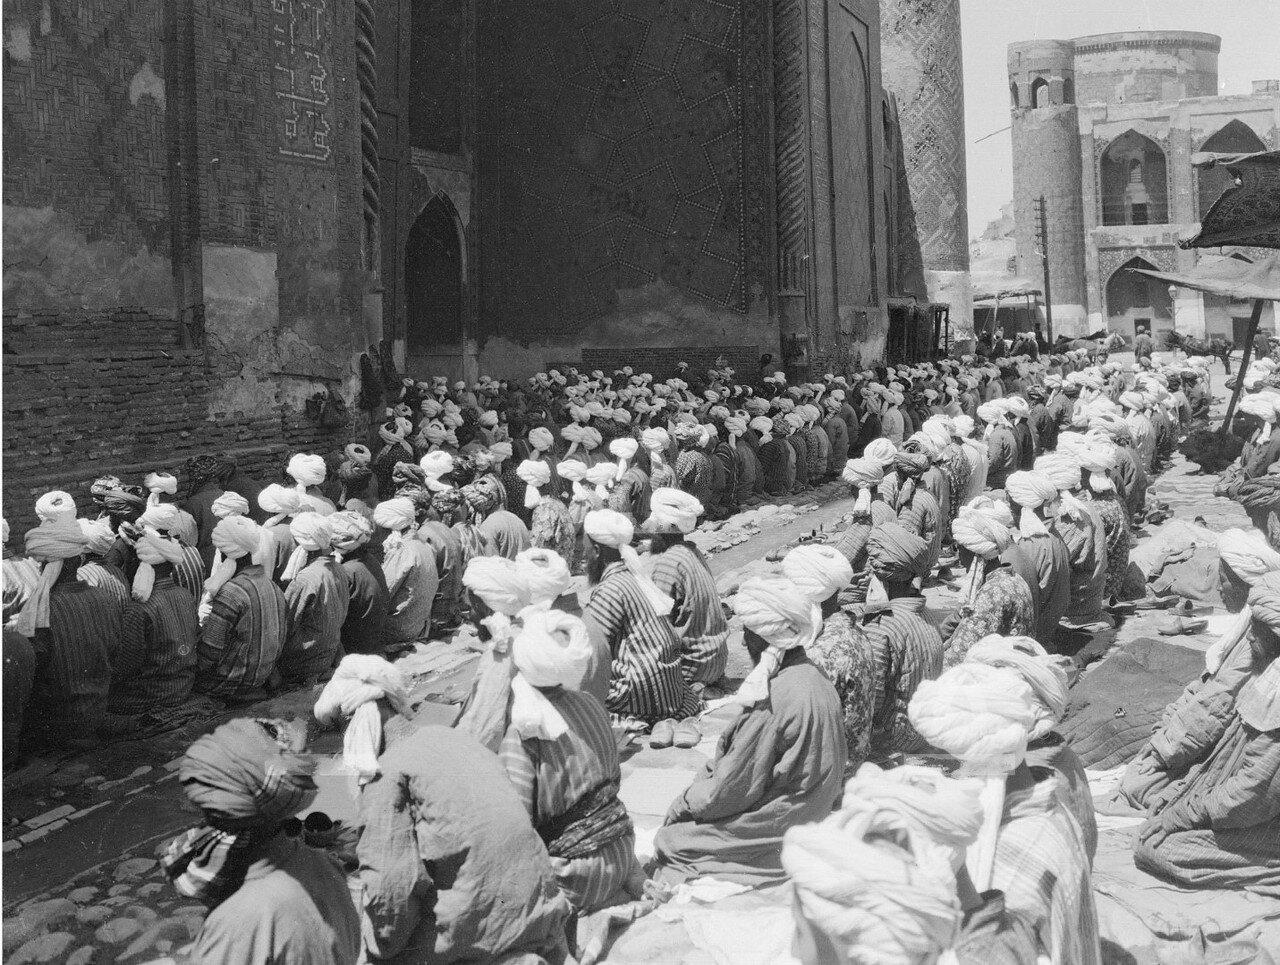 Самарканд. Площадь Регистан. Медресе Шердор. Пятничная молитва